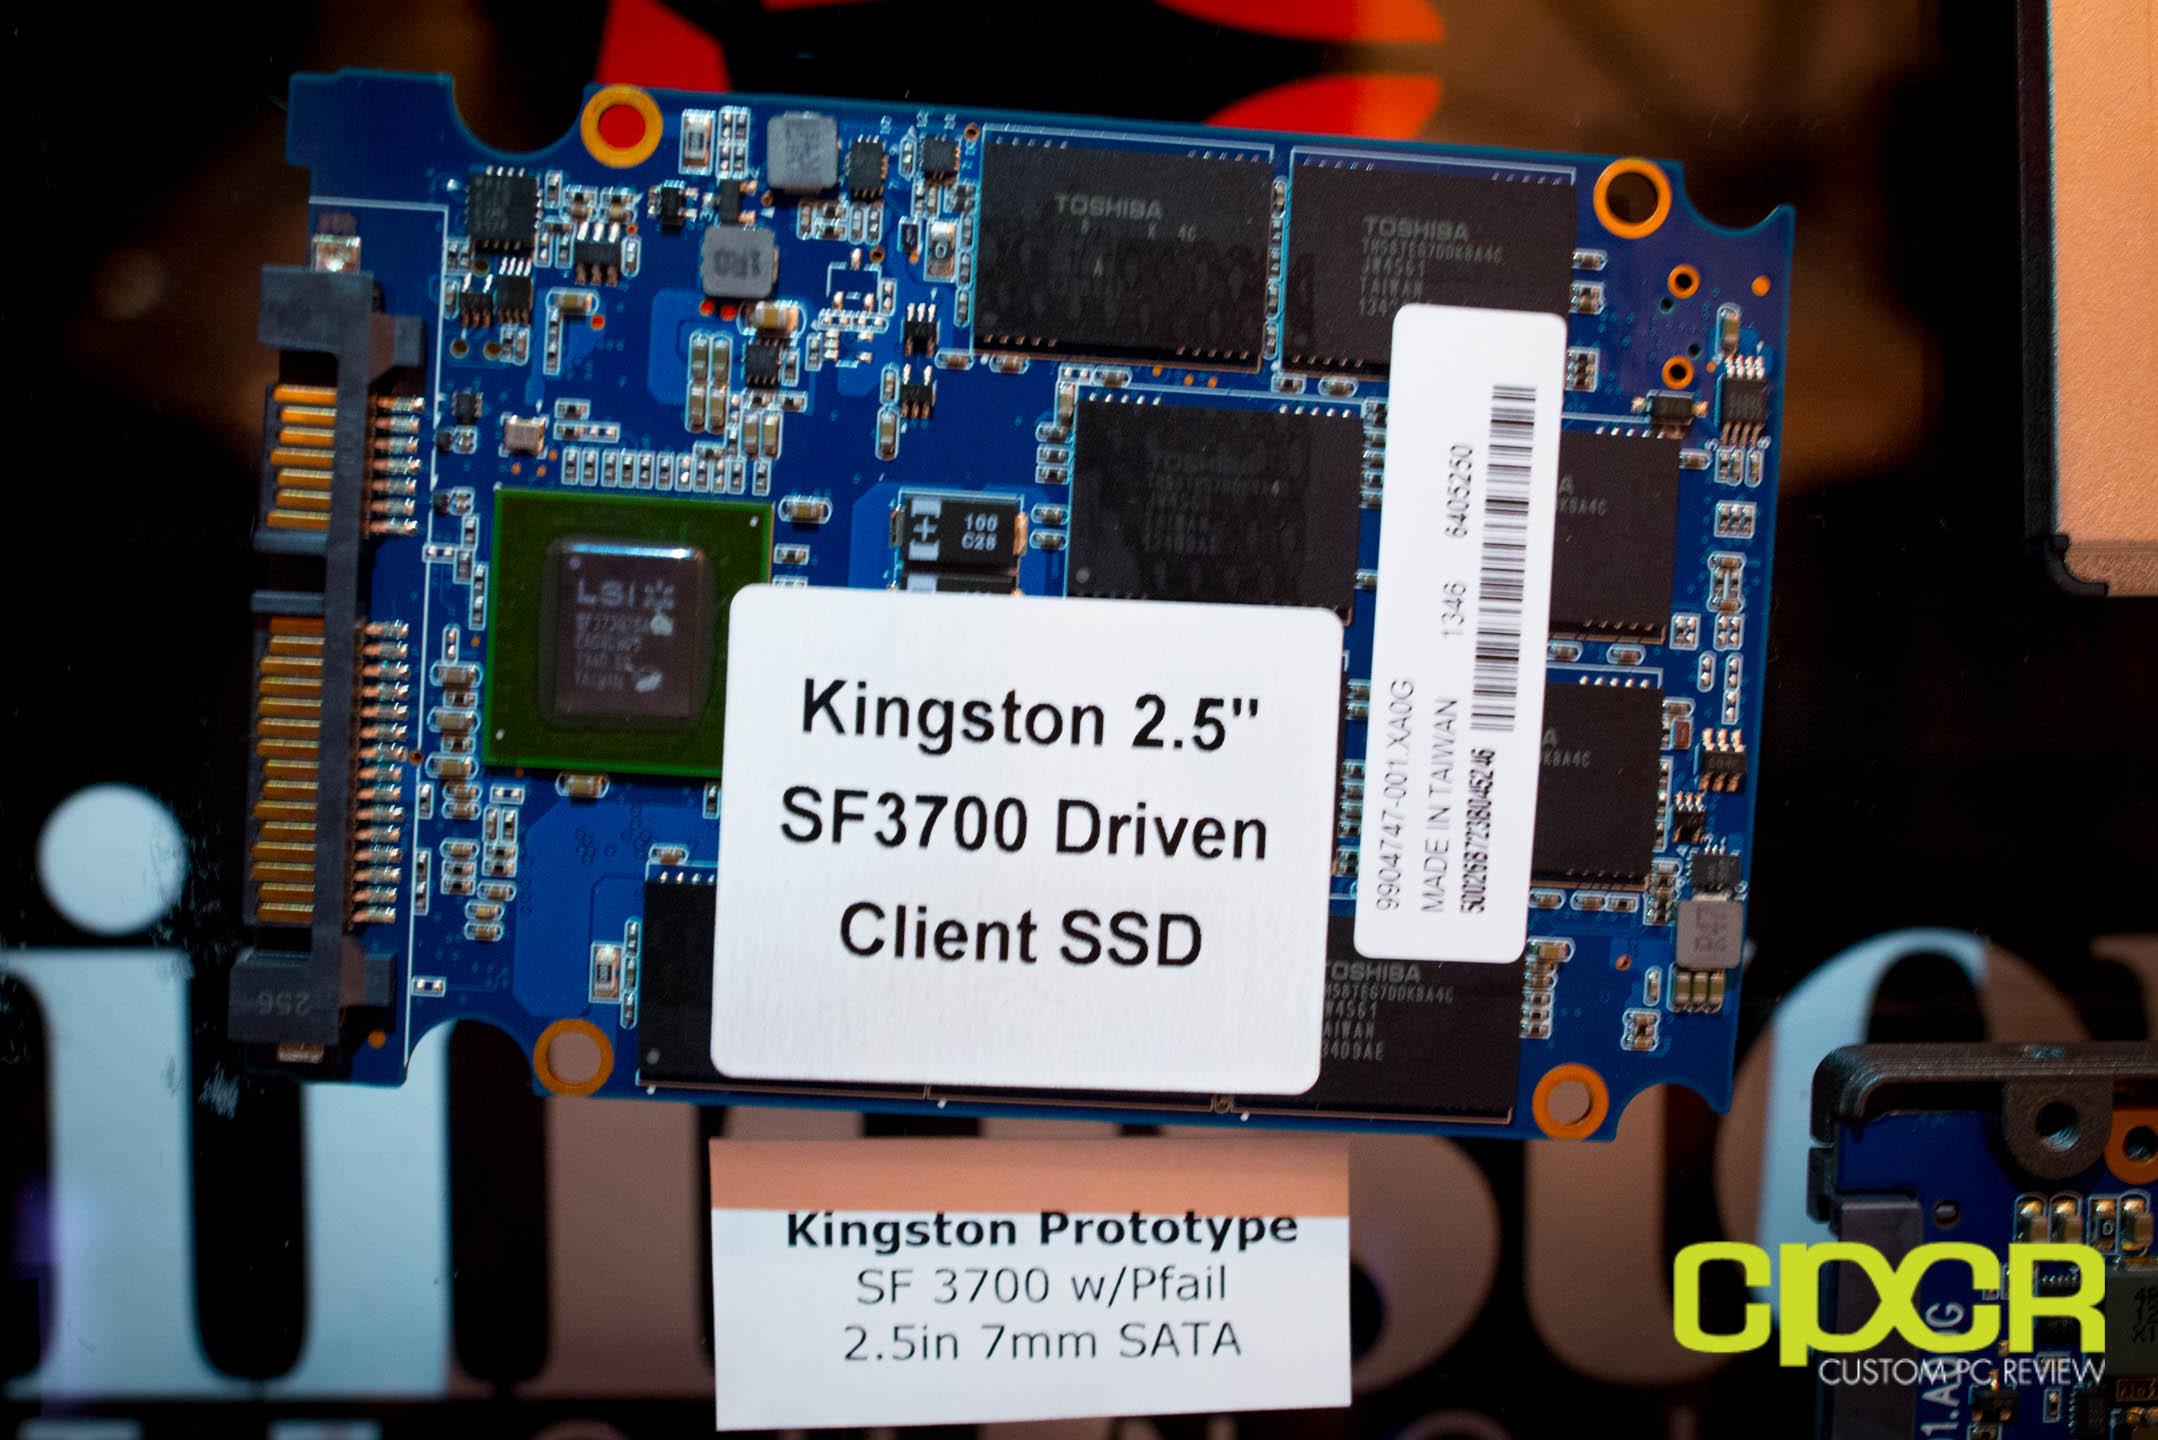 kingston-technology-ais-2013-custom-pc-review-3